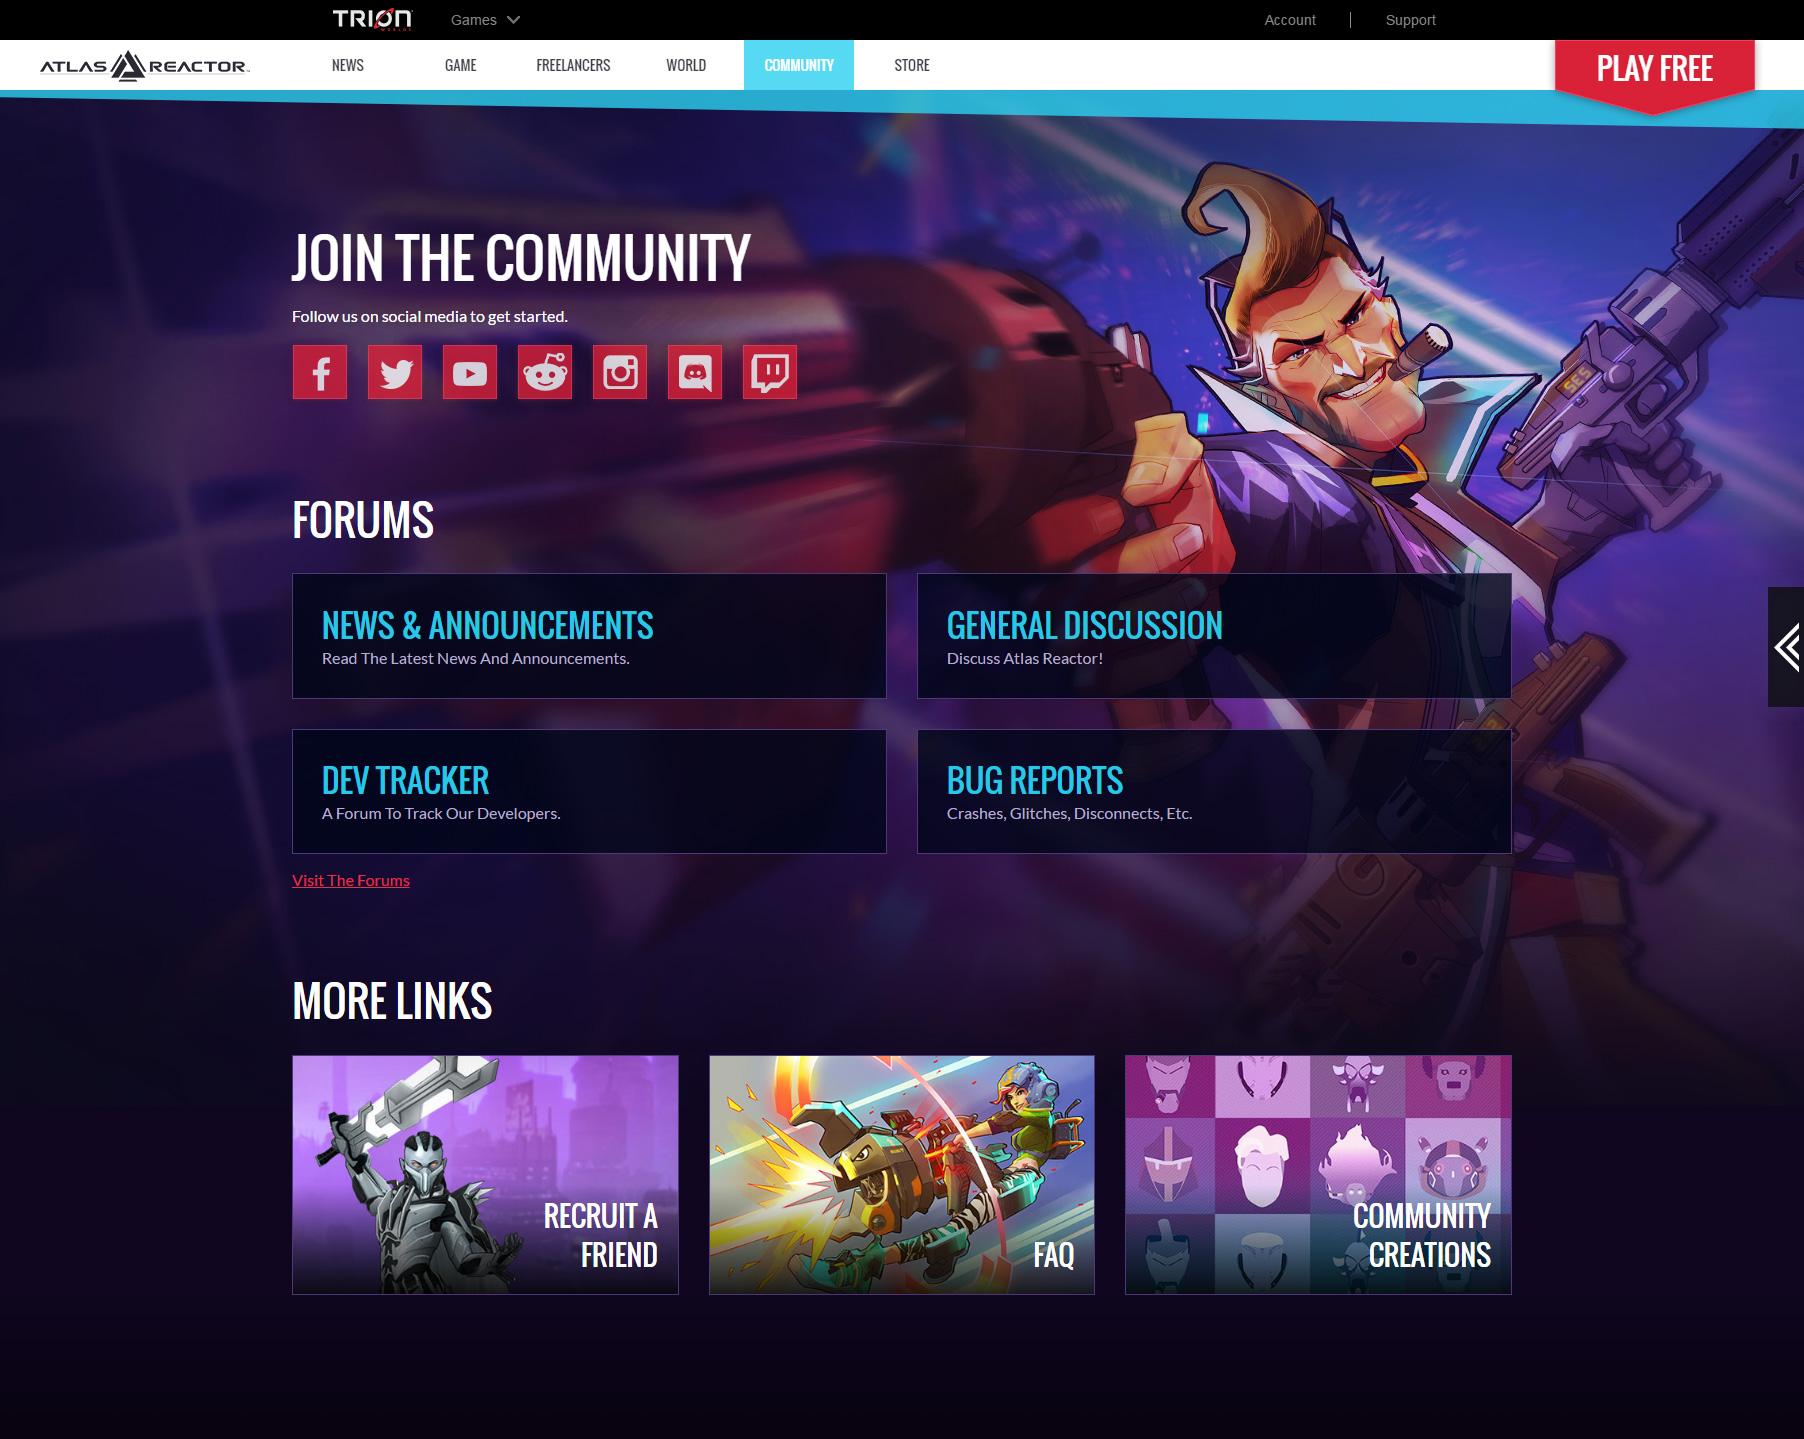 Atlas Reactor - Community